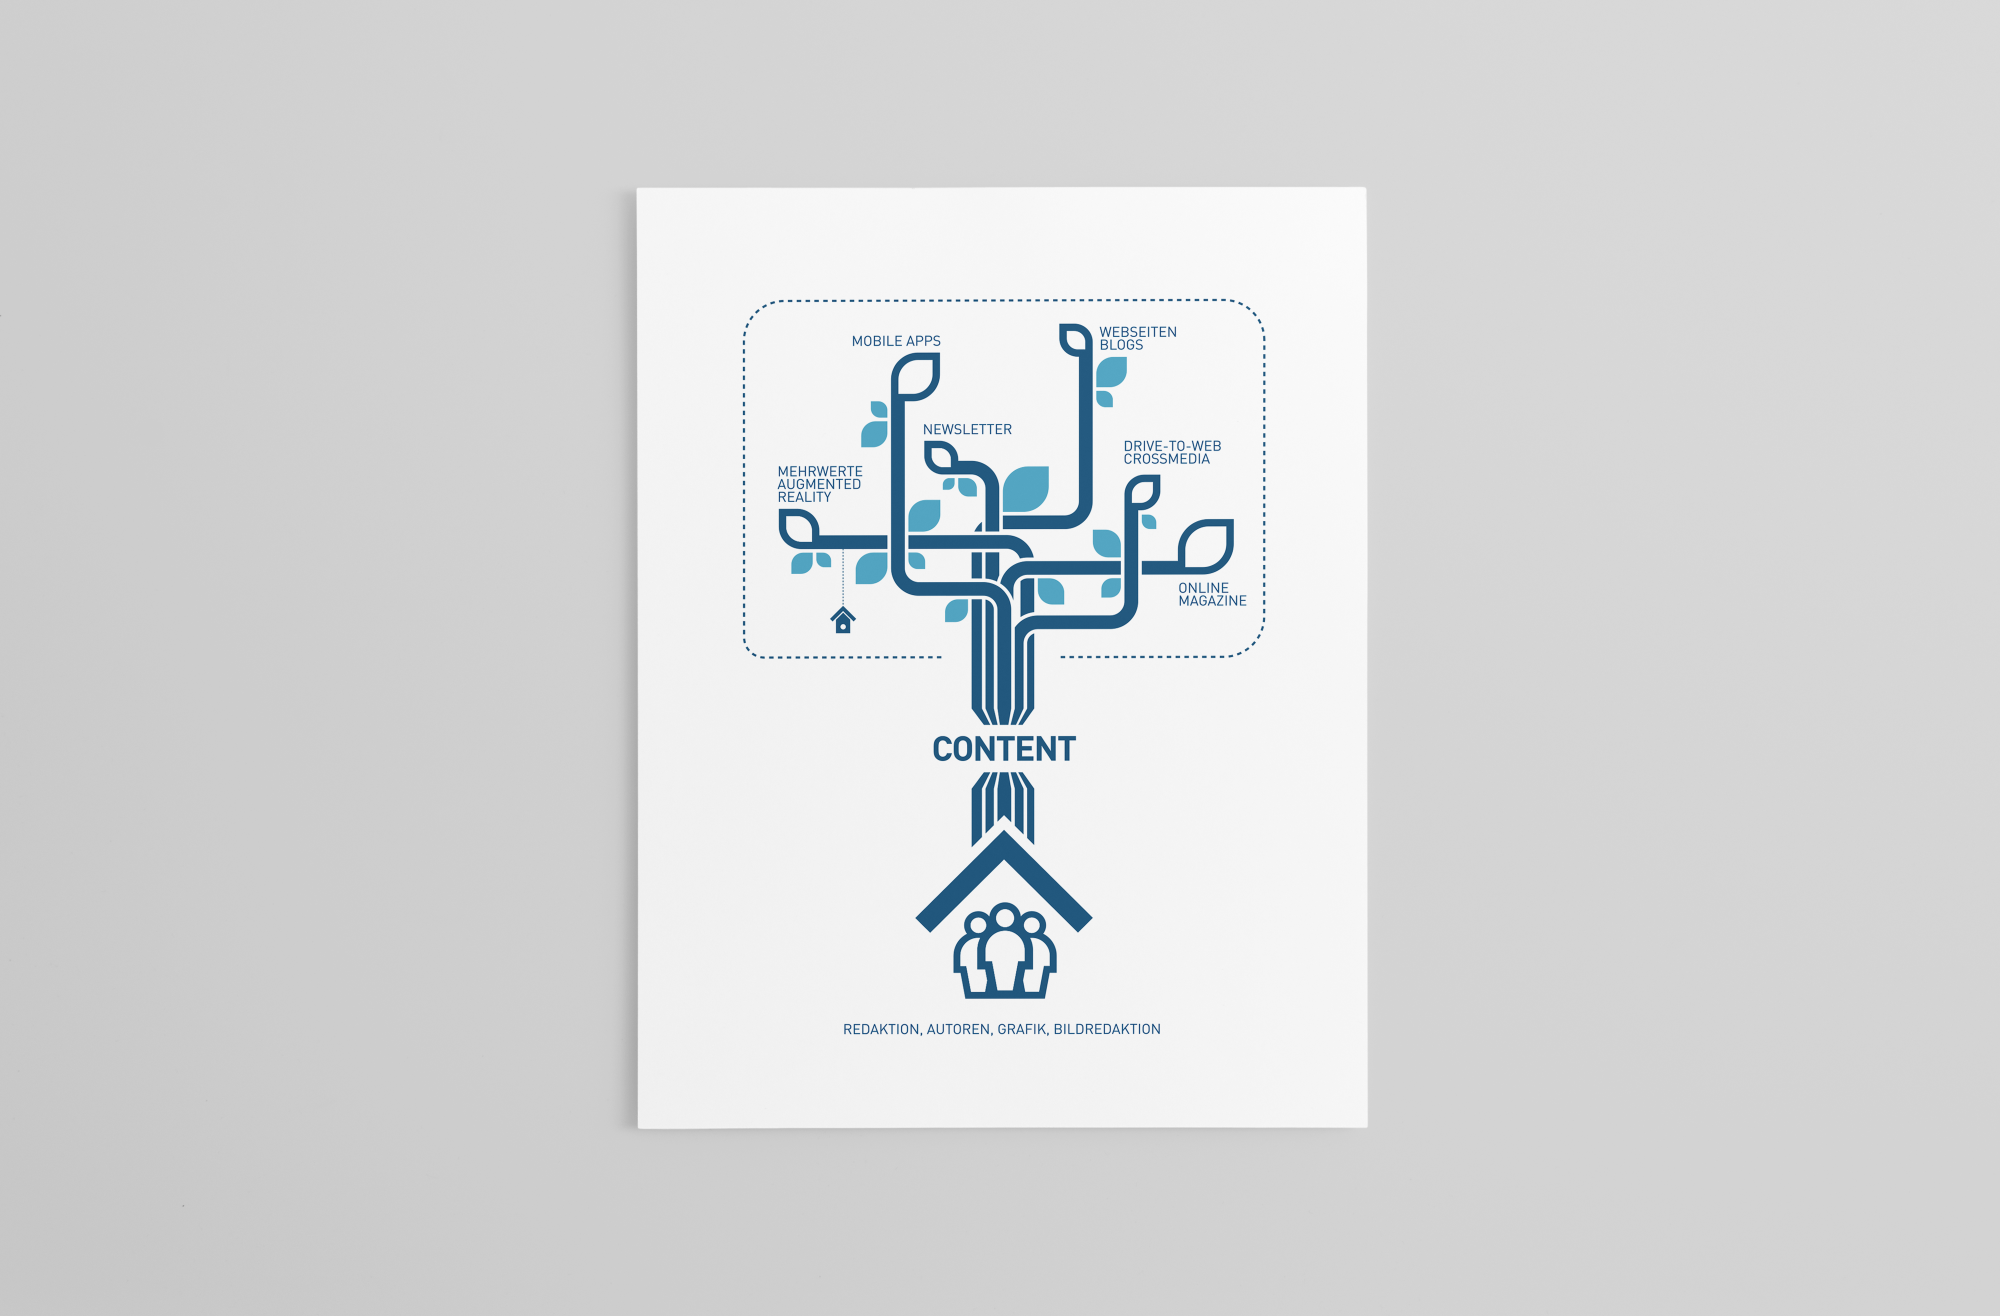 infographic design for journal international